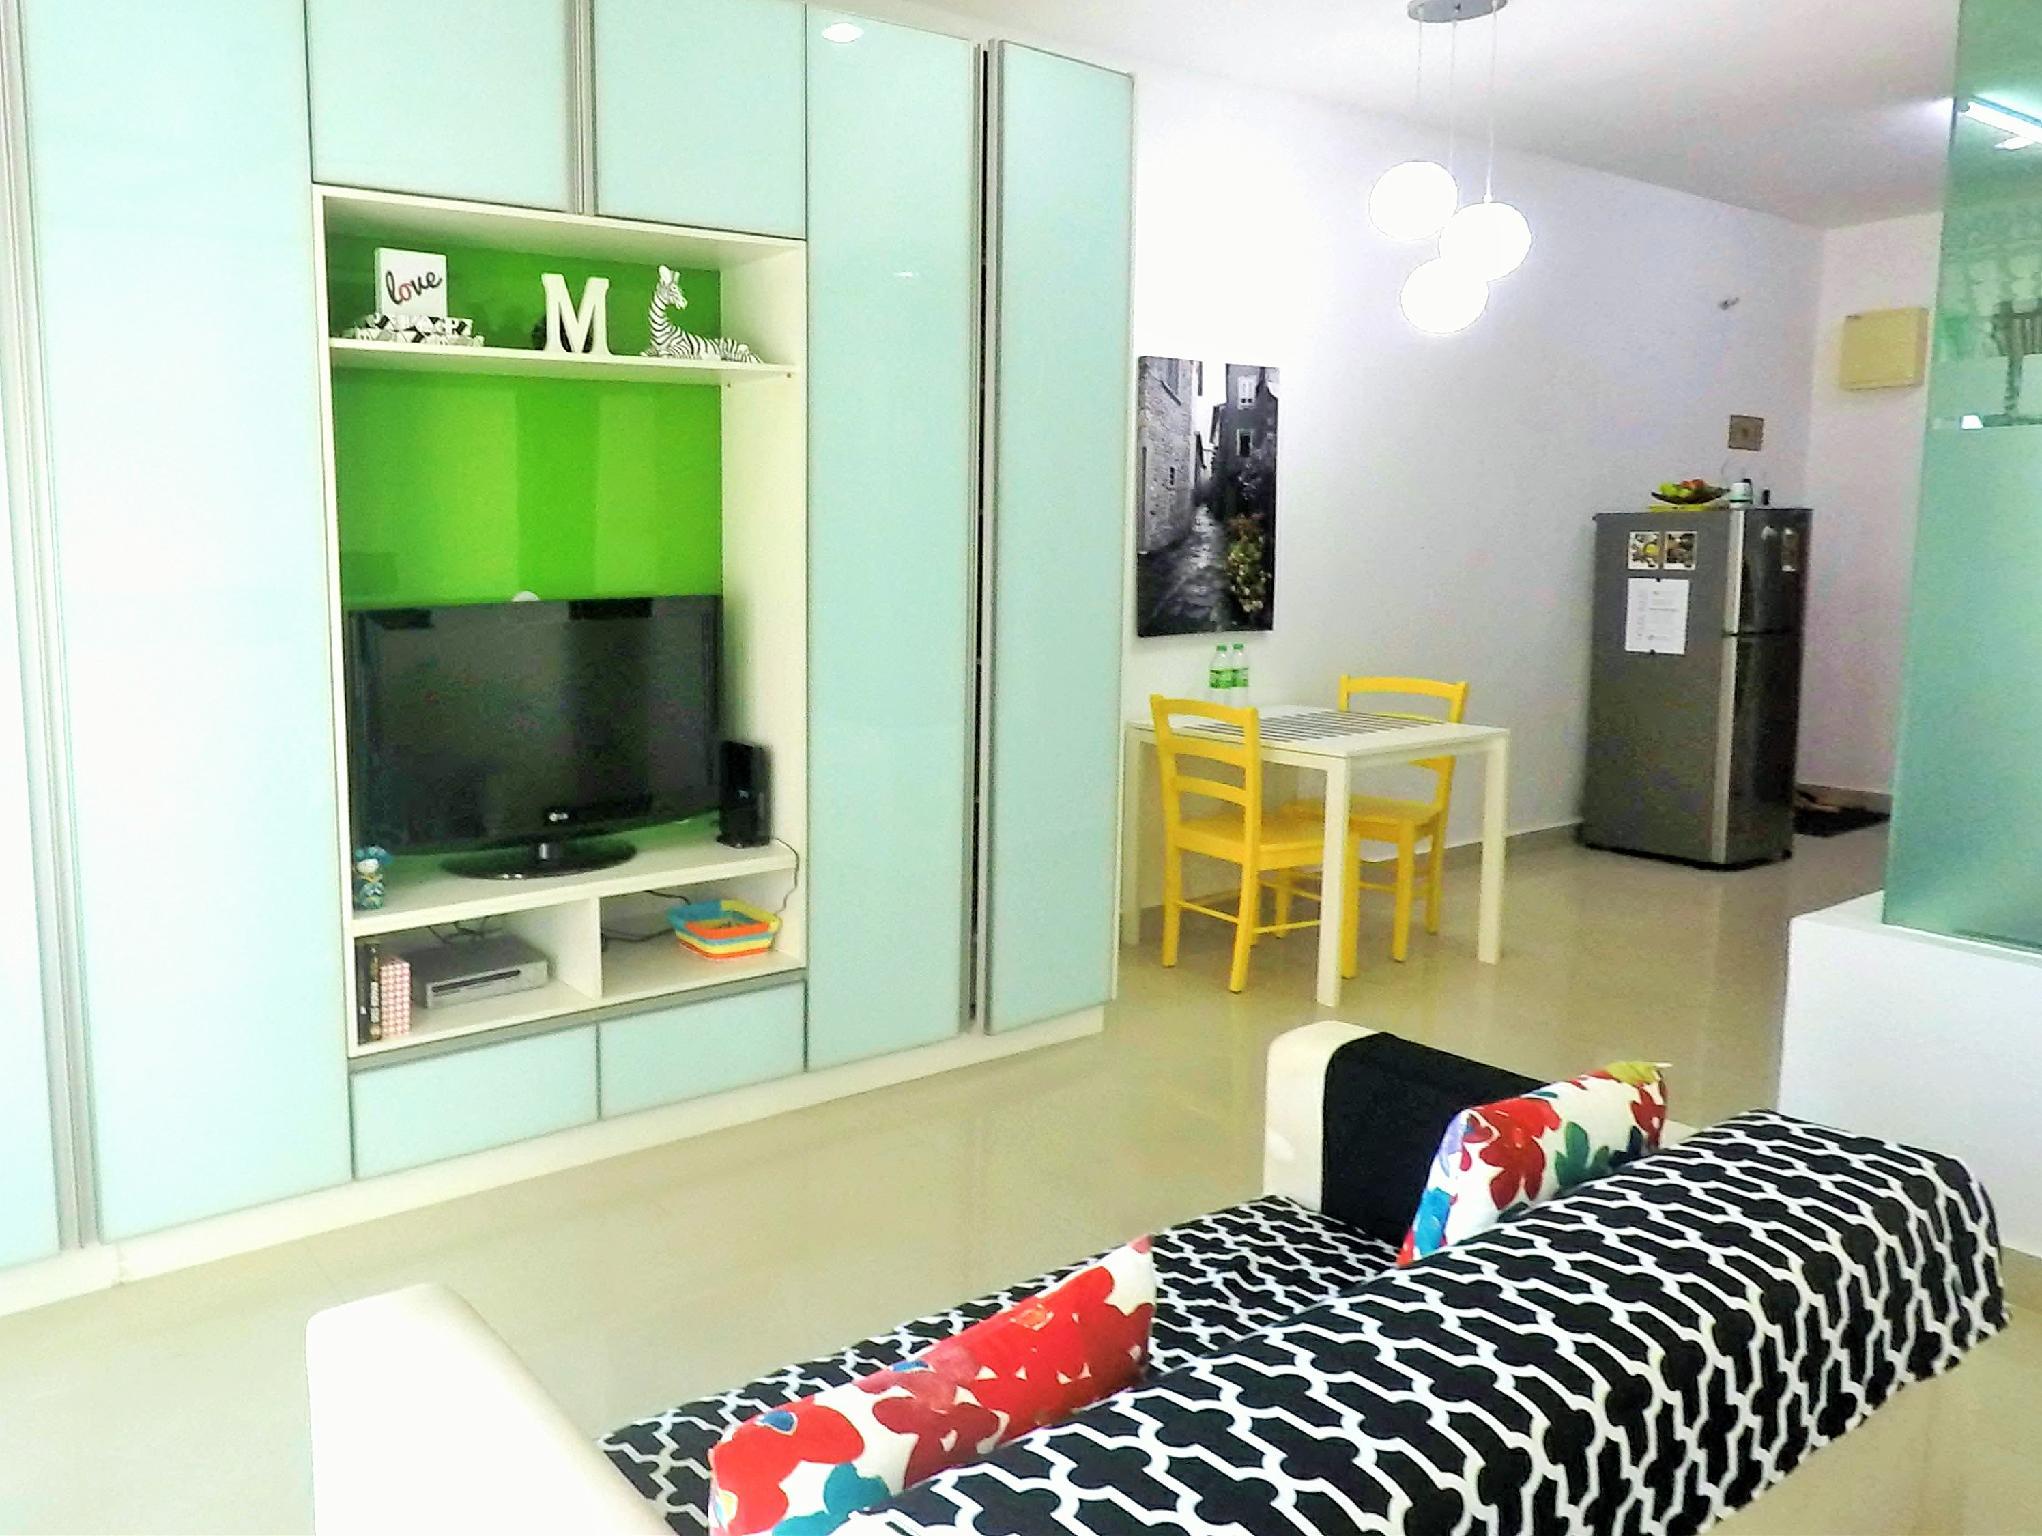 A5 Studio Apartment At Damansara Perdana  Uc608 Uc57d     Uc624 Uc2dc Ub294  Uae38  Uc815 Ubcf4